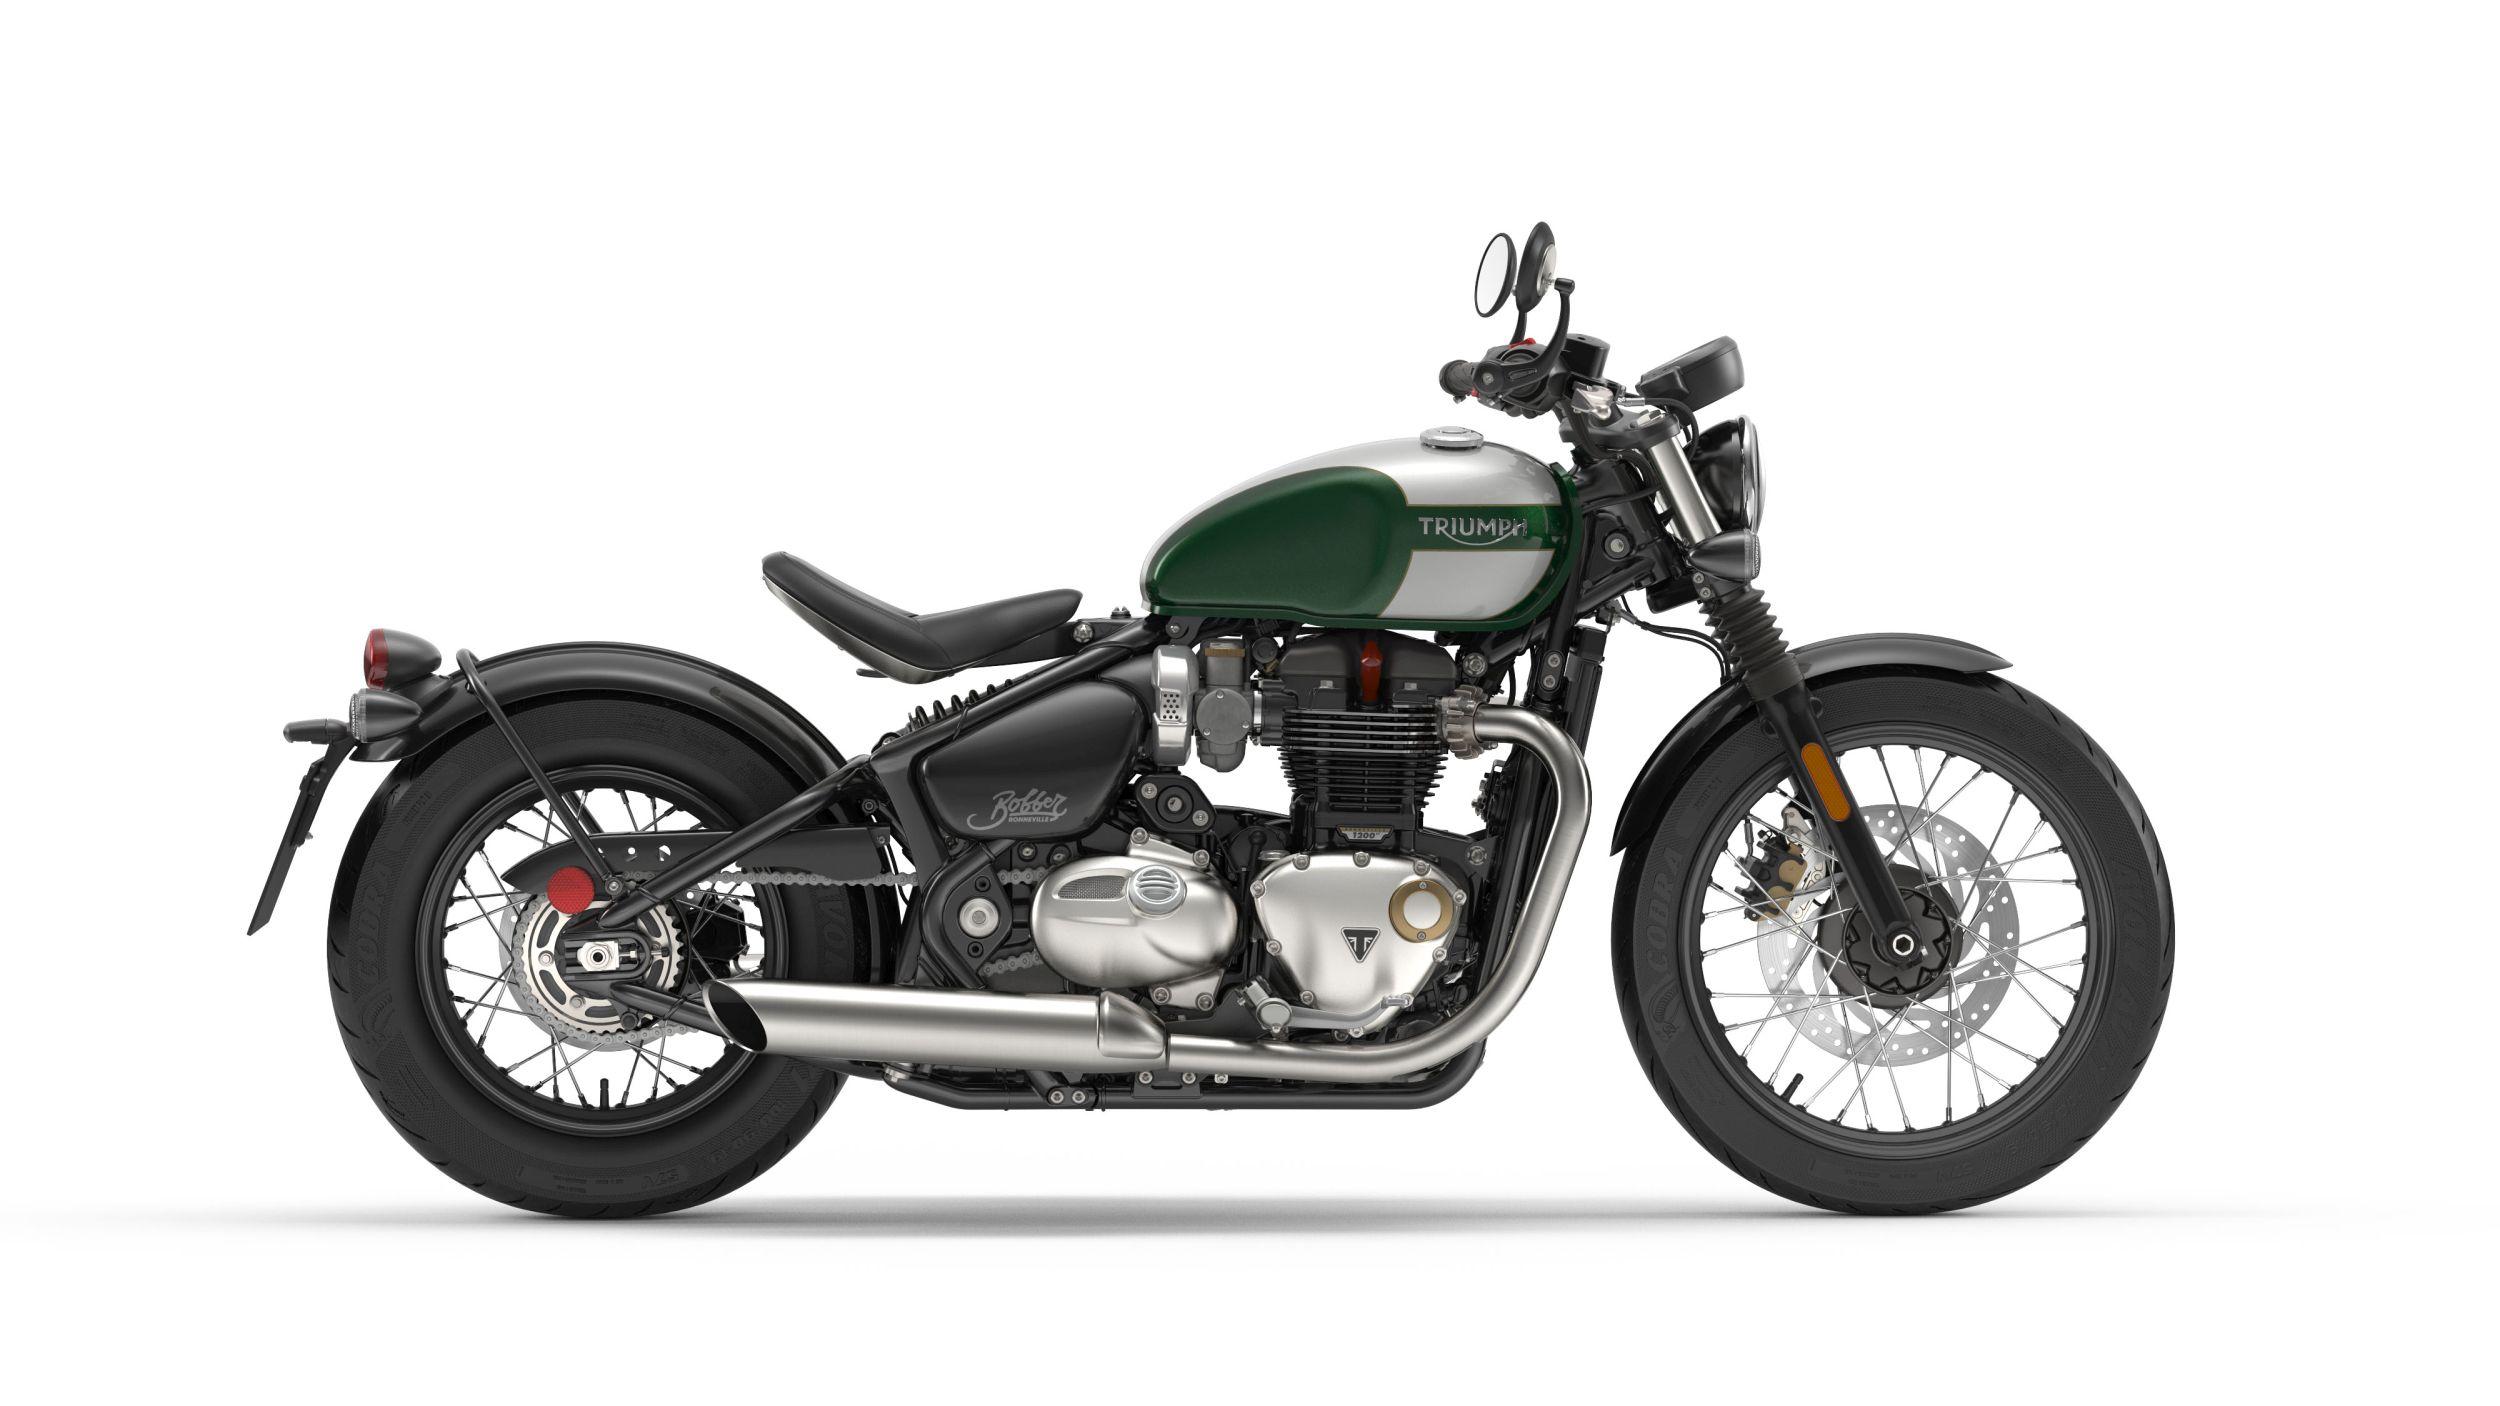 triumph daytona 1200 technische daten motorrad bild idee. Black Bedroom Furniture Sets. Home Design Ideas